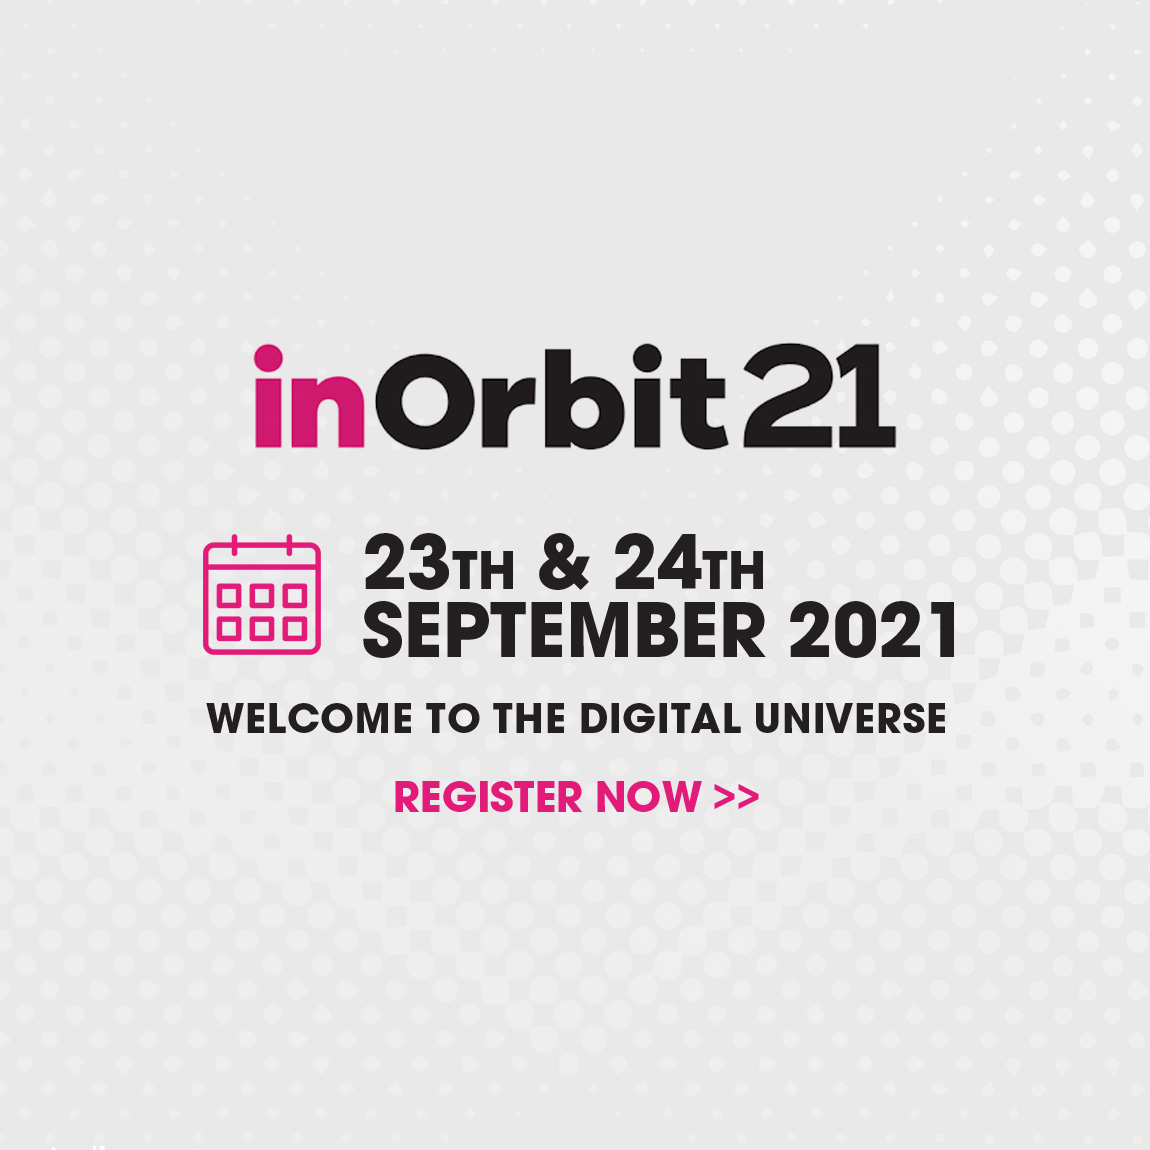 inOrbit21